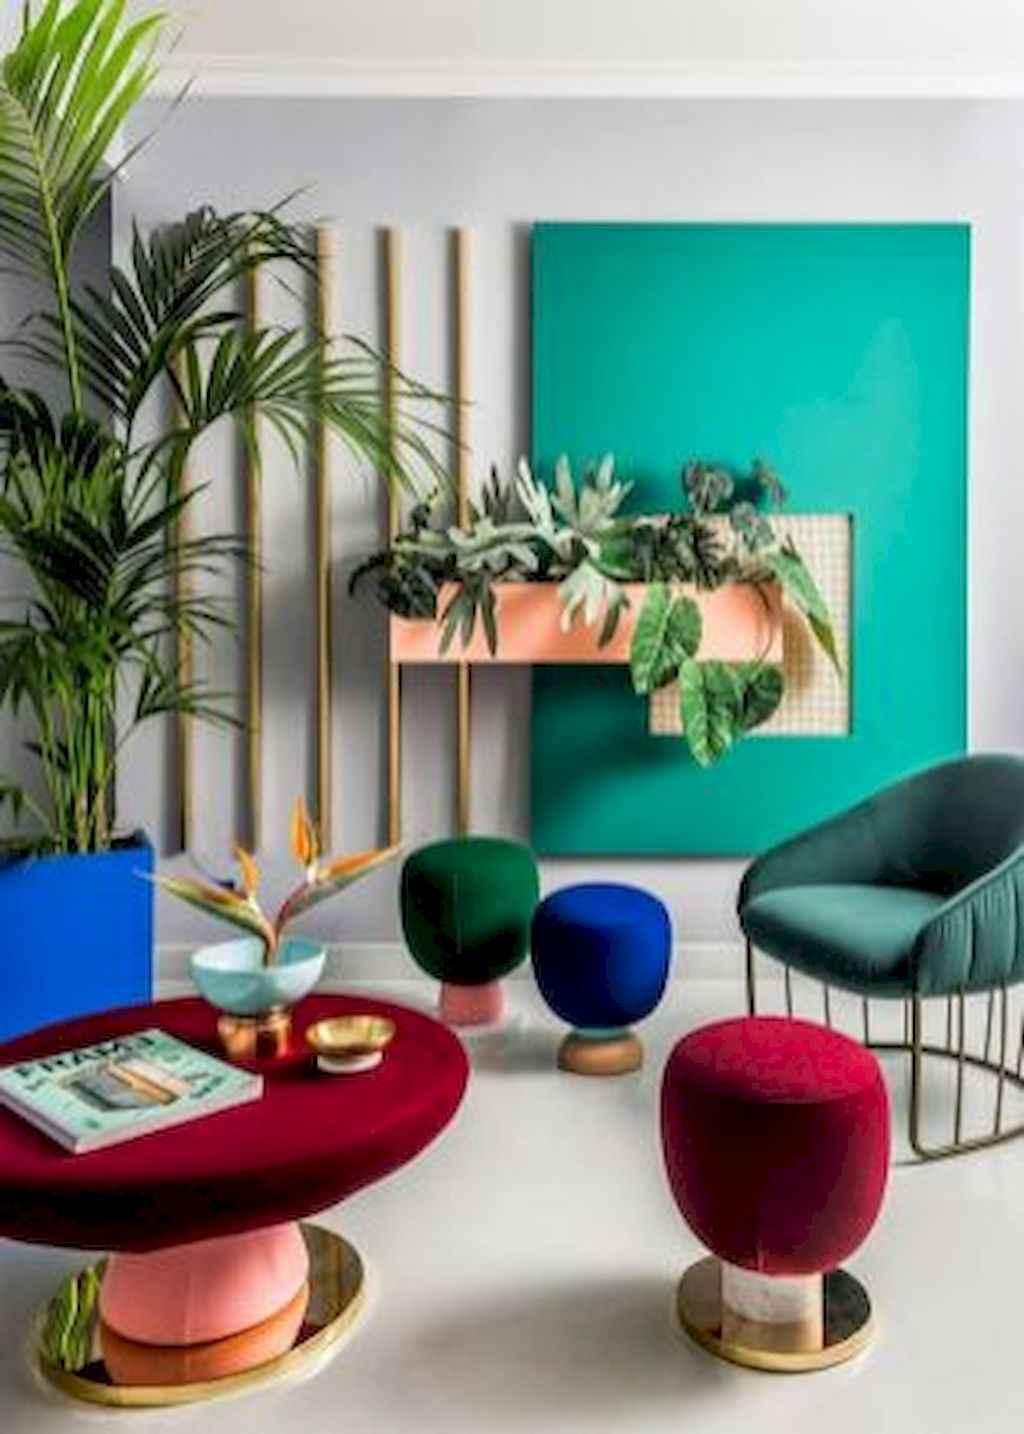 80 Elegant Harmony Interior Design Ideas For First Couple (5)